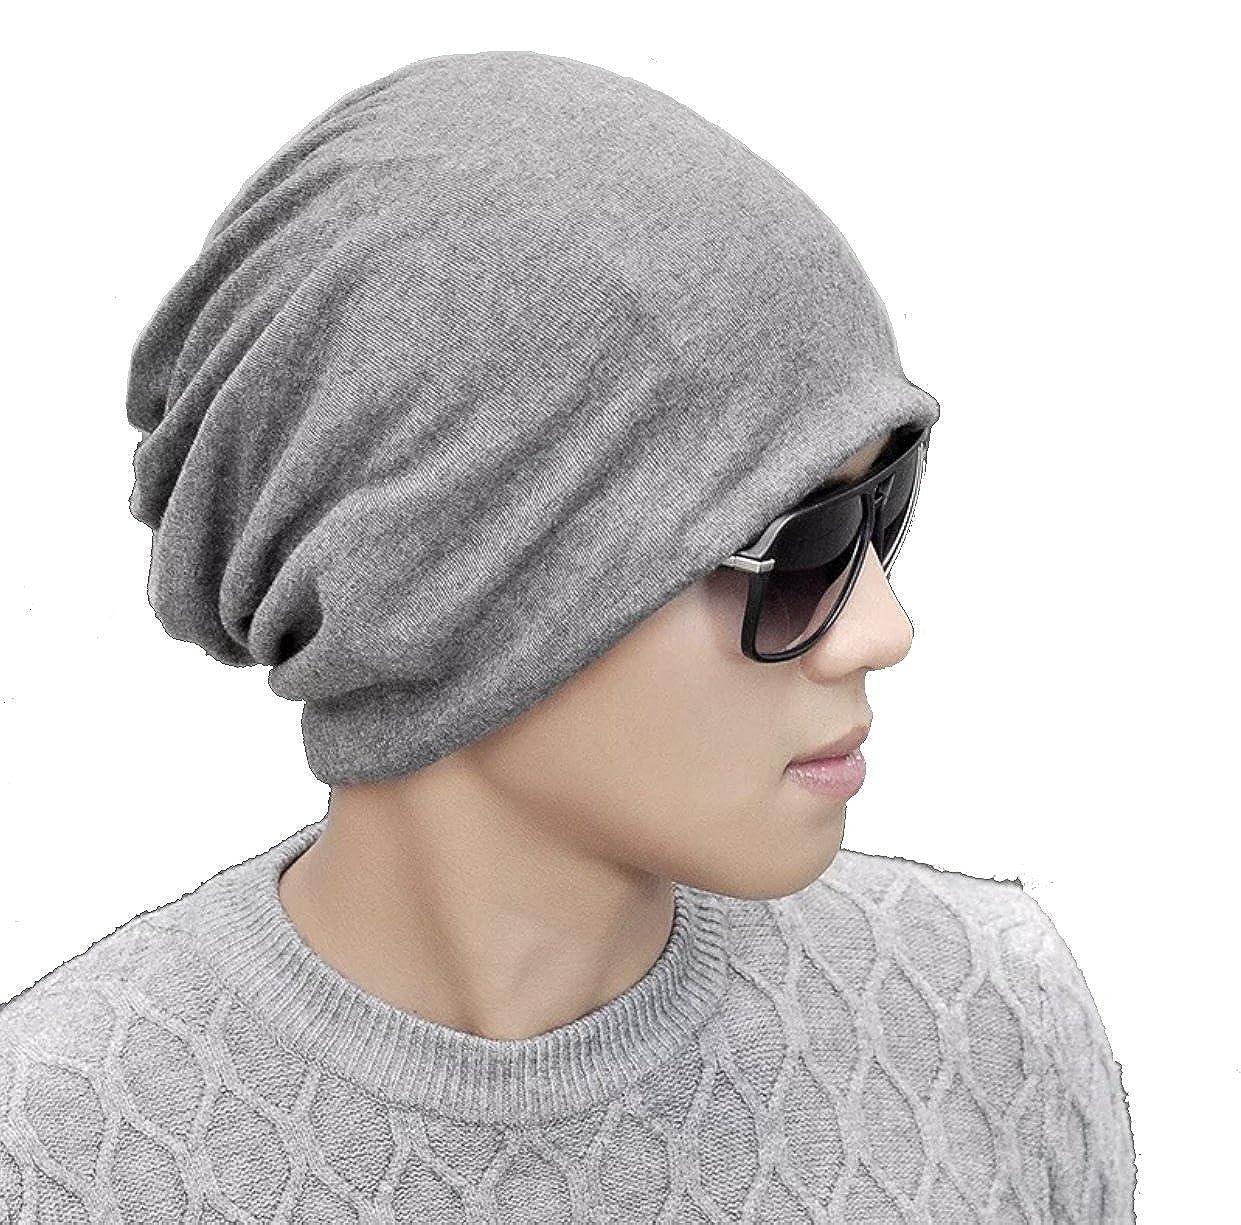 8a0ba93dc8a W Y YING Cotton Three-Ways Warm Soft Mens Womens Grey Slouchy Beanie Hats  (Dark Grey) at Amazon Women s Clothing store